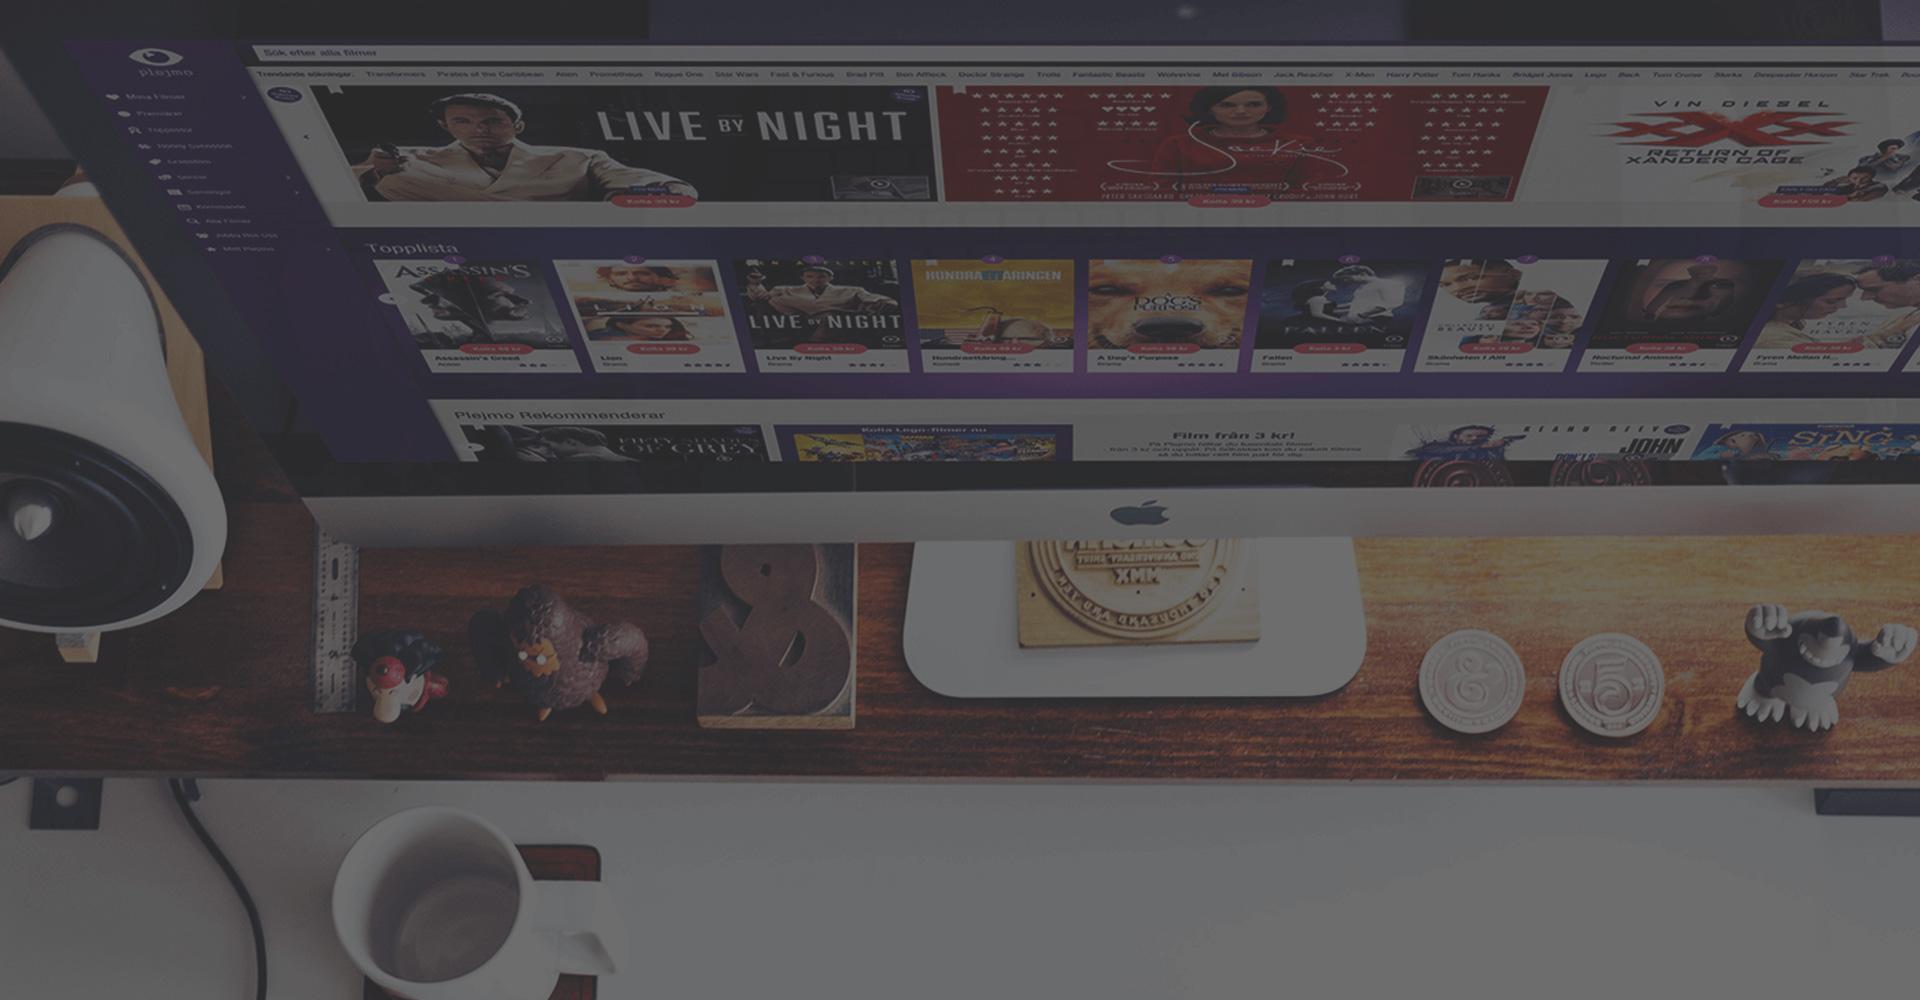 Sappa TV Everywhere and IPTV solution | Live OTT service | Magine Pro